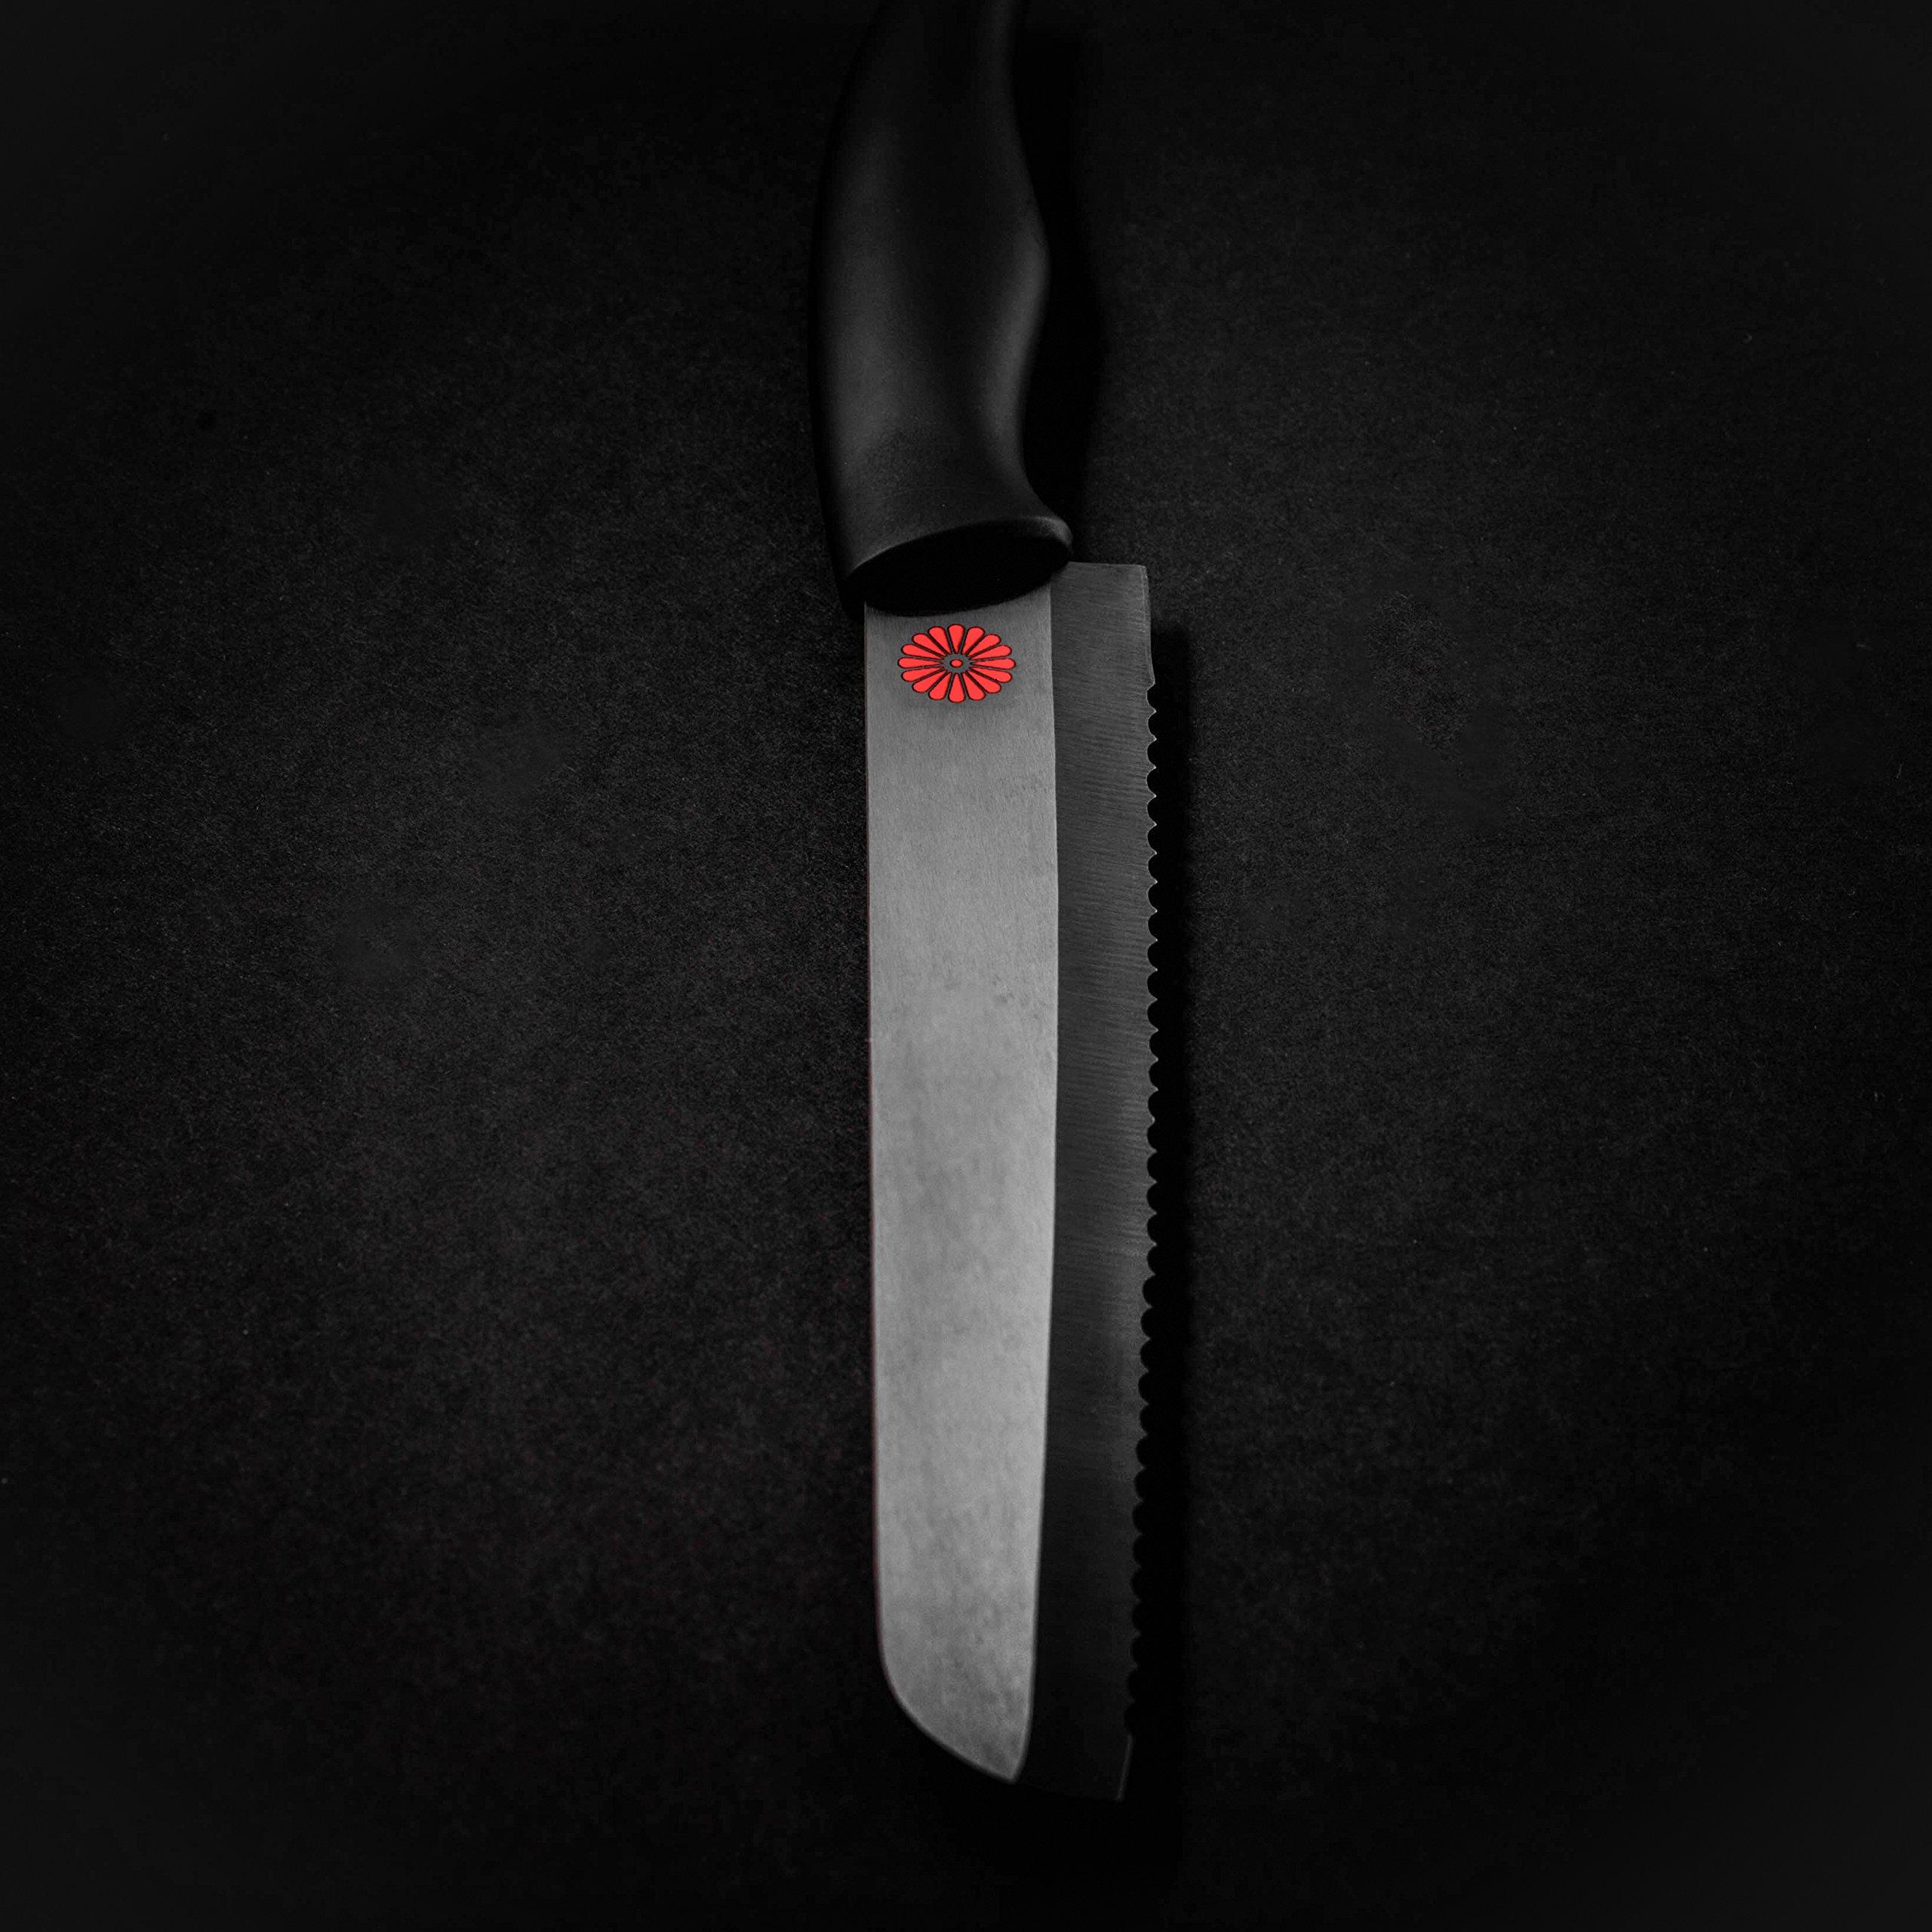 Kikusumi 4-Piece Chef Knife Gift Set Bundle - SUMI Black Handle + Black Ceramic Blade - 7 inch Gyuto Chef Knife + 5 inch Santoku + 3 inch Paring + 8 inch Serrated Bread Knife + 4 Knife Sheaths by Kikusumi (Image #9)